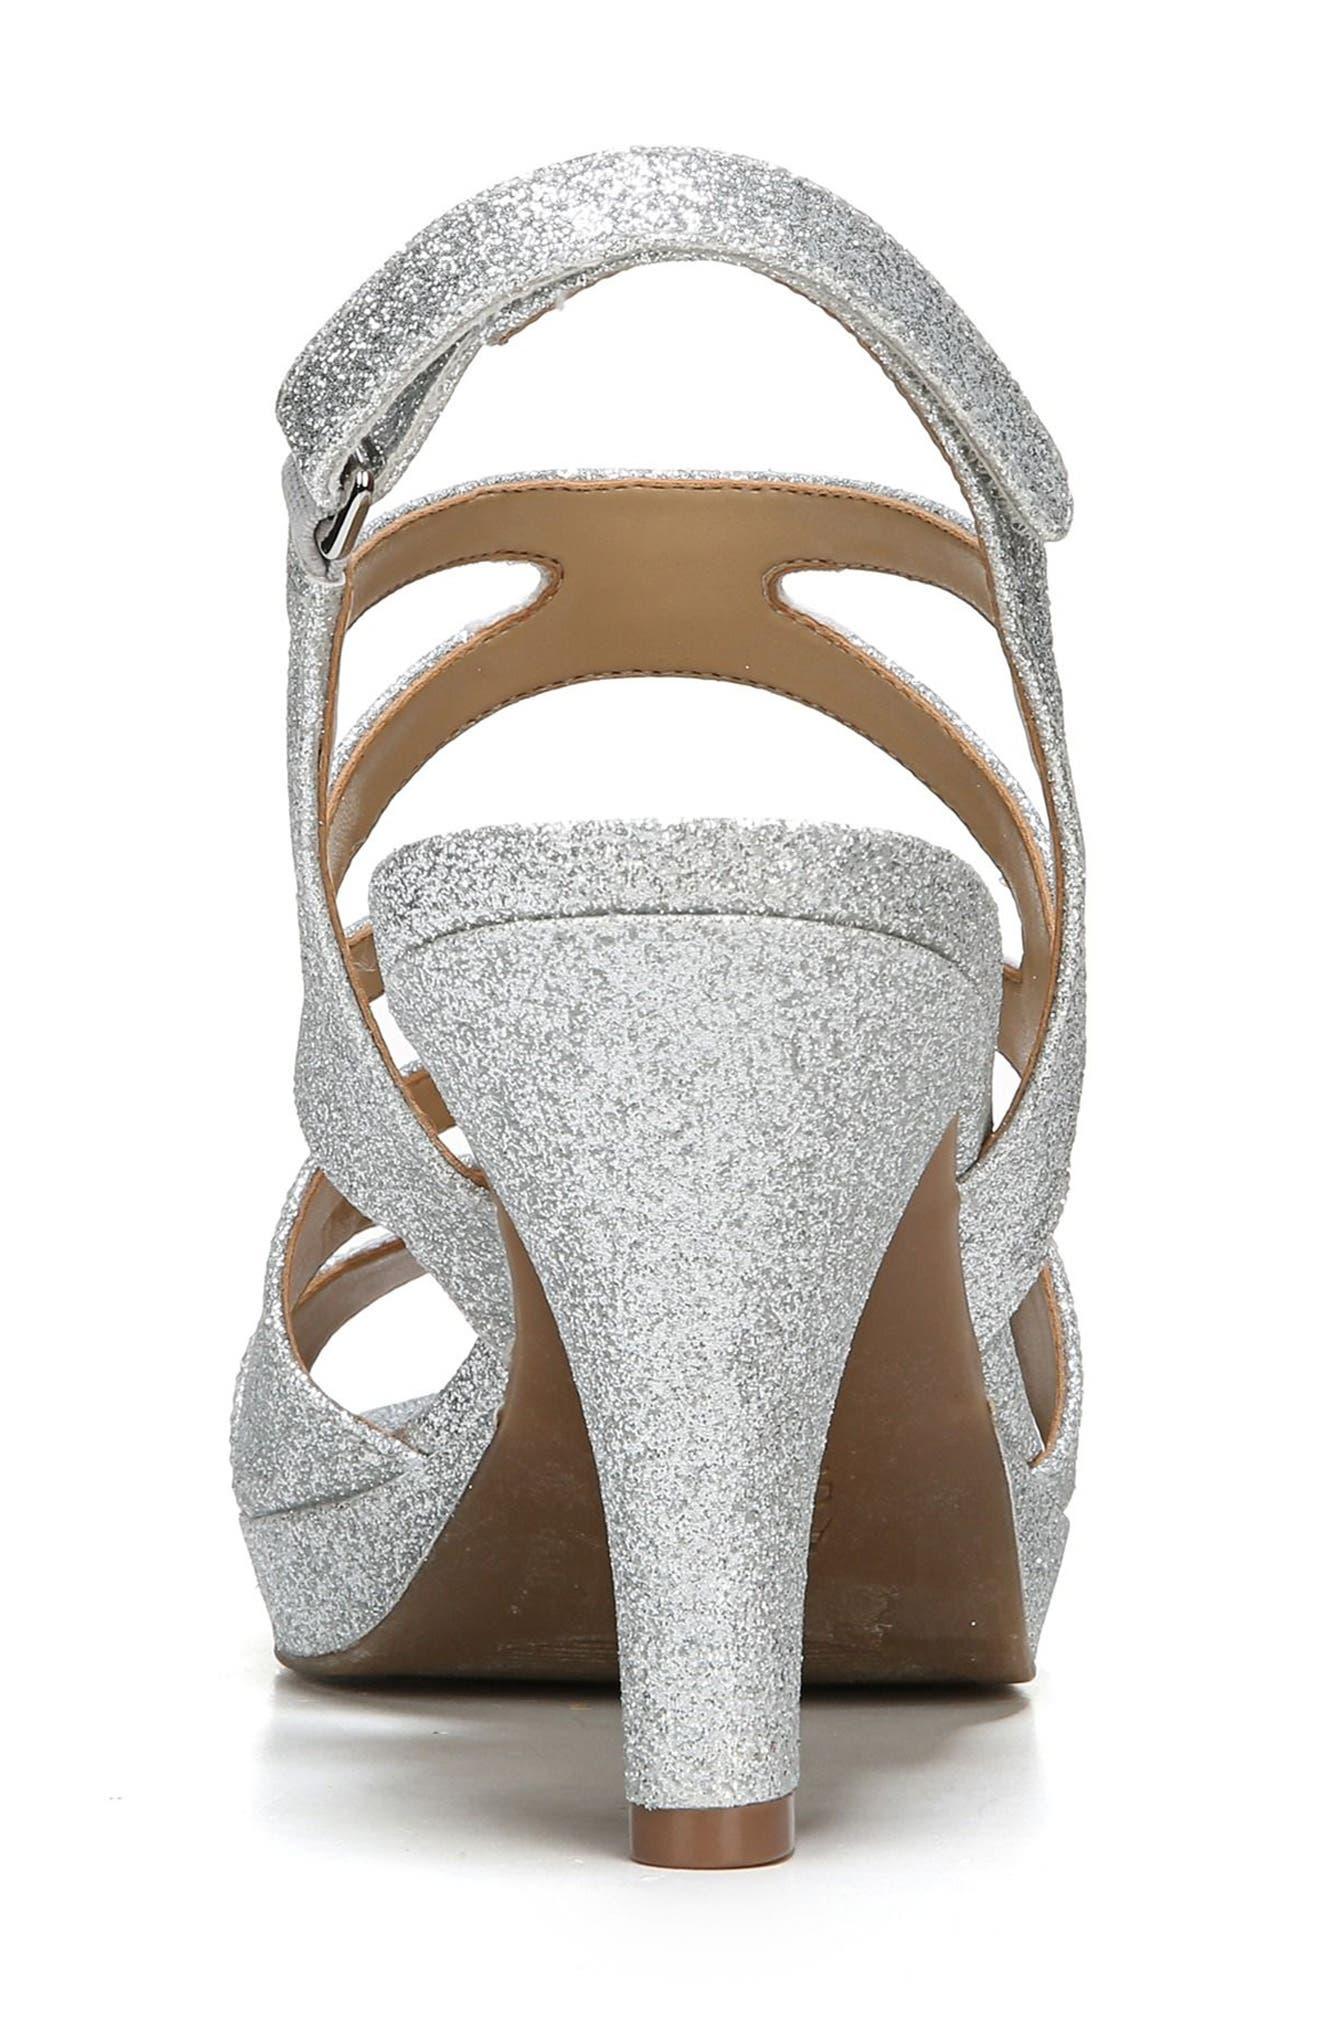 NATURALIZER, 'Pressley' Slingback Platform Sandal, Alternate thumbnail 7, color, SILVER GLITTER FAUX LEATHER